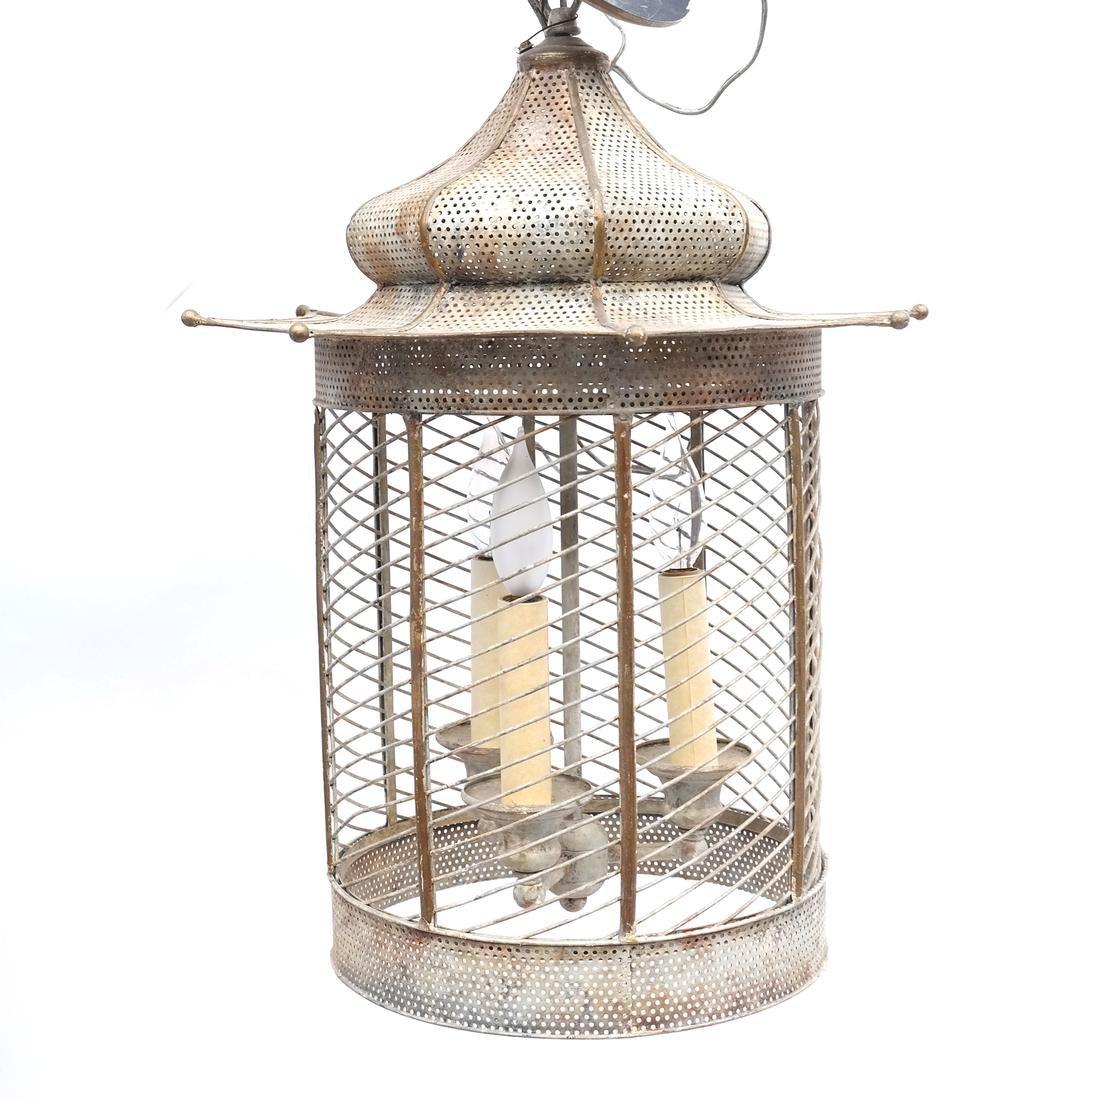 Pagoda-Form Lantern